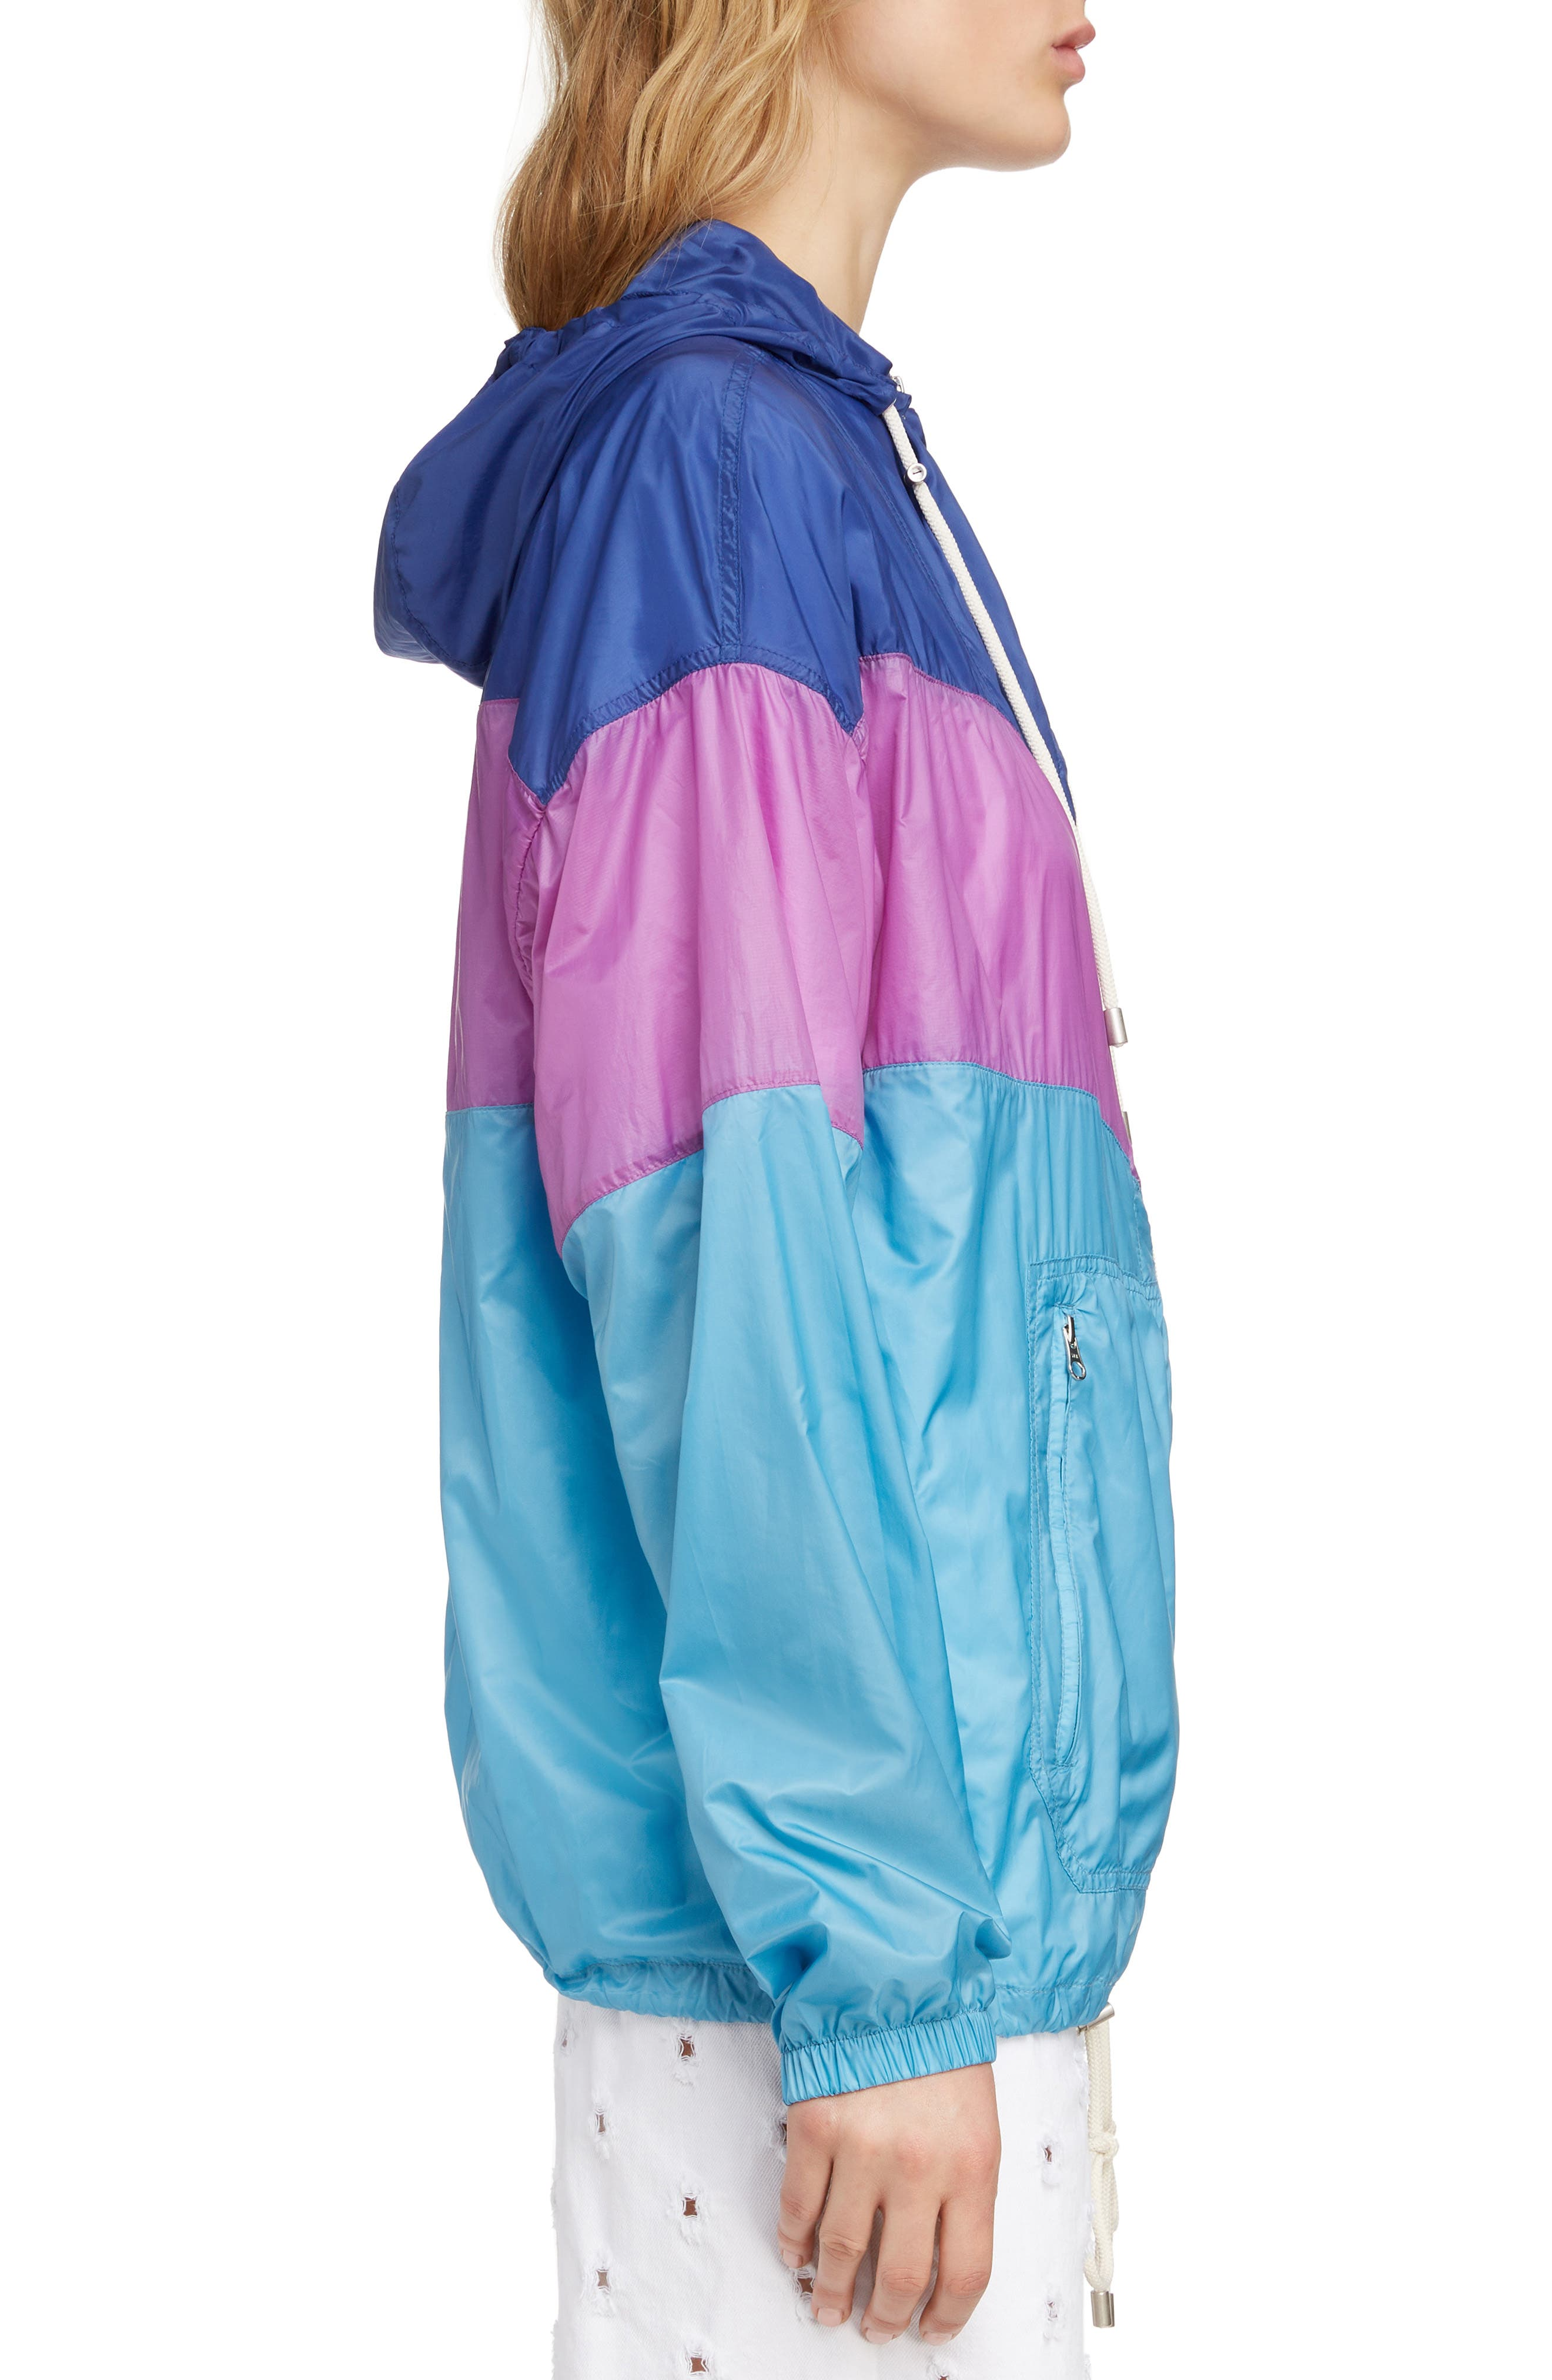 ISABEL MARANT ÉTOILE, Kyriel Colorblock Hooded Jacket, Alternate thumbnail 4, color, ELECTRIC BLUE/ VIOLET